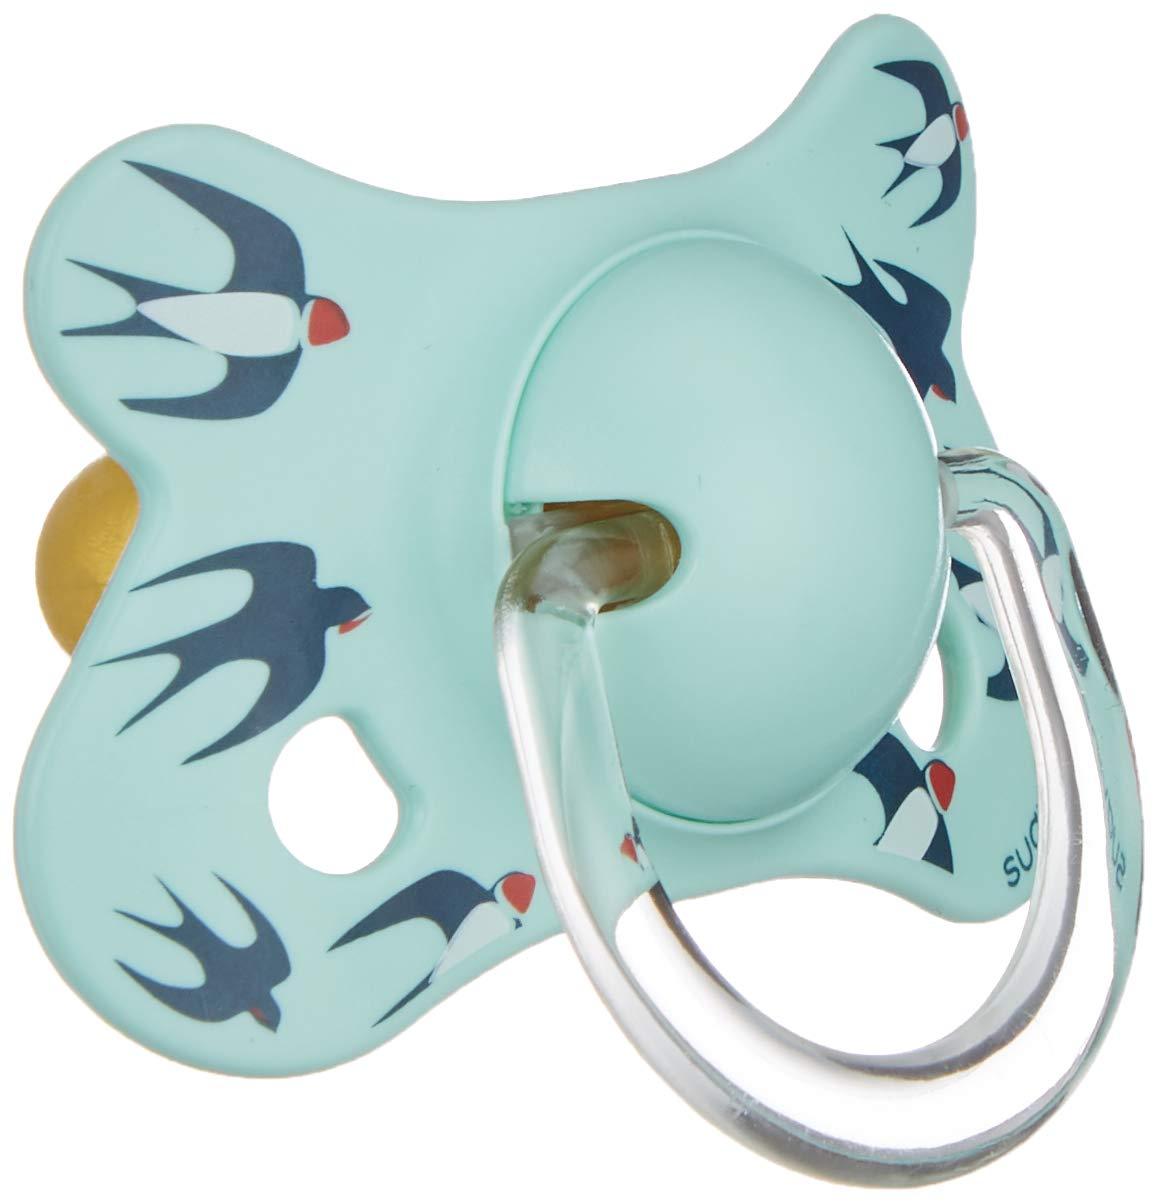 Suavinex 303043 - Chupete fisiológico látex, 4-18 meses, golondrinas, color verde: Amazon.es: Bebé